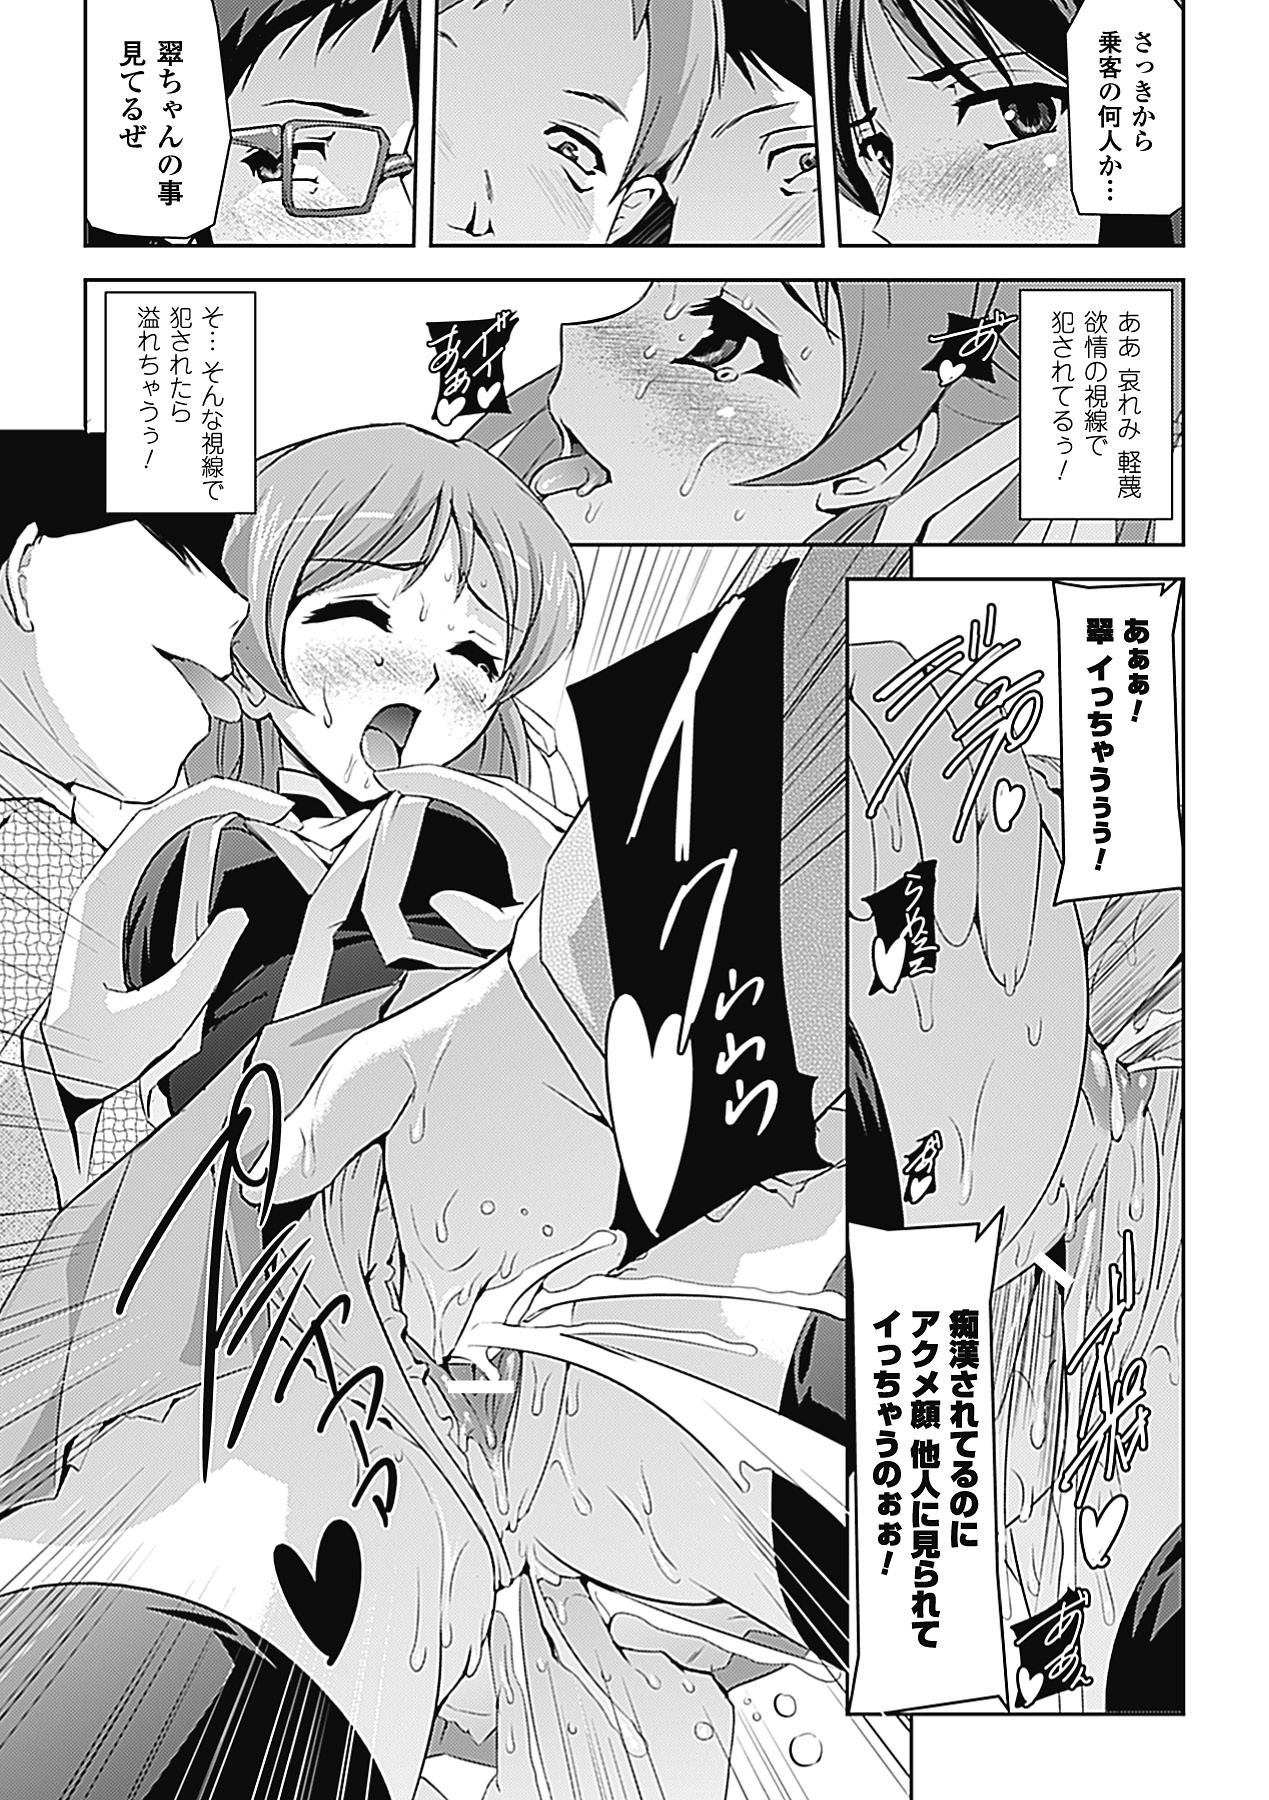 Chikan Anthology Comics Vol. 2 30